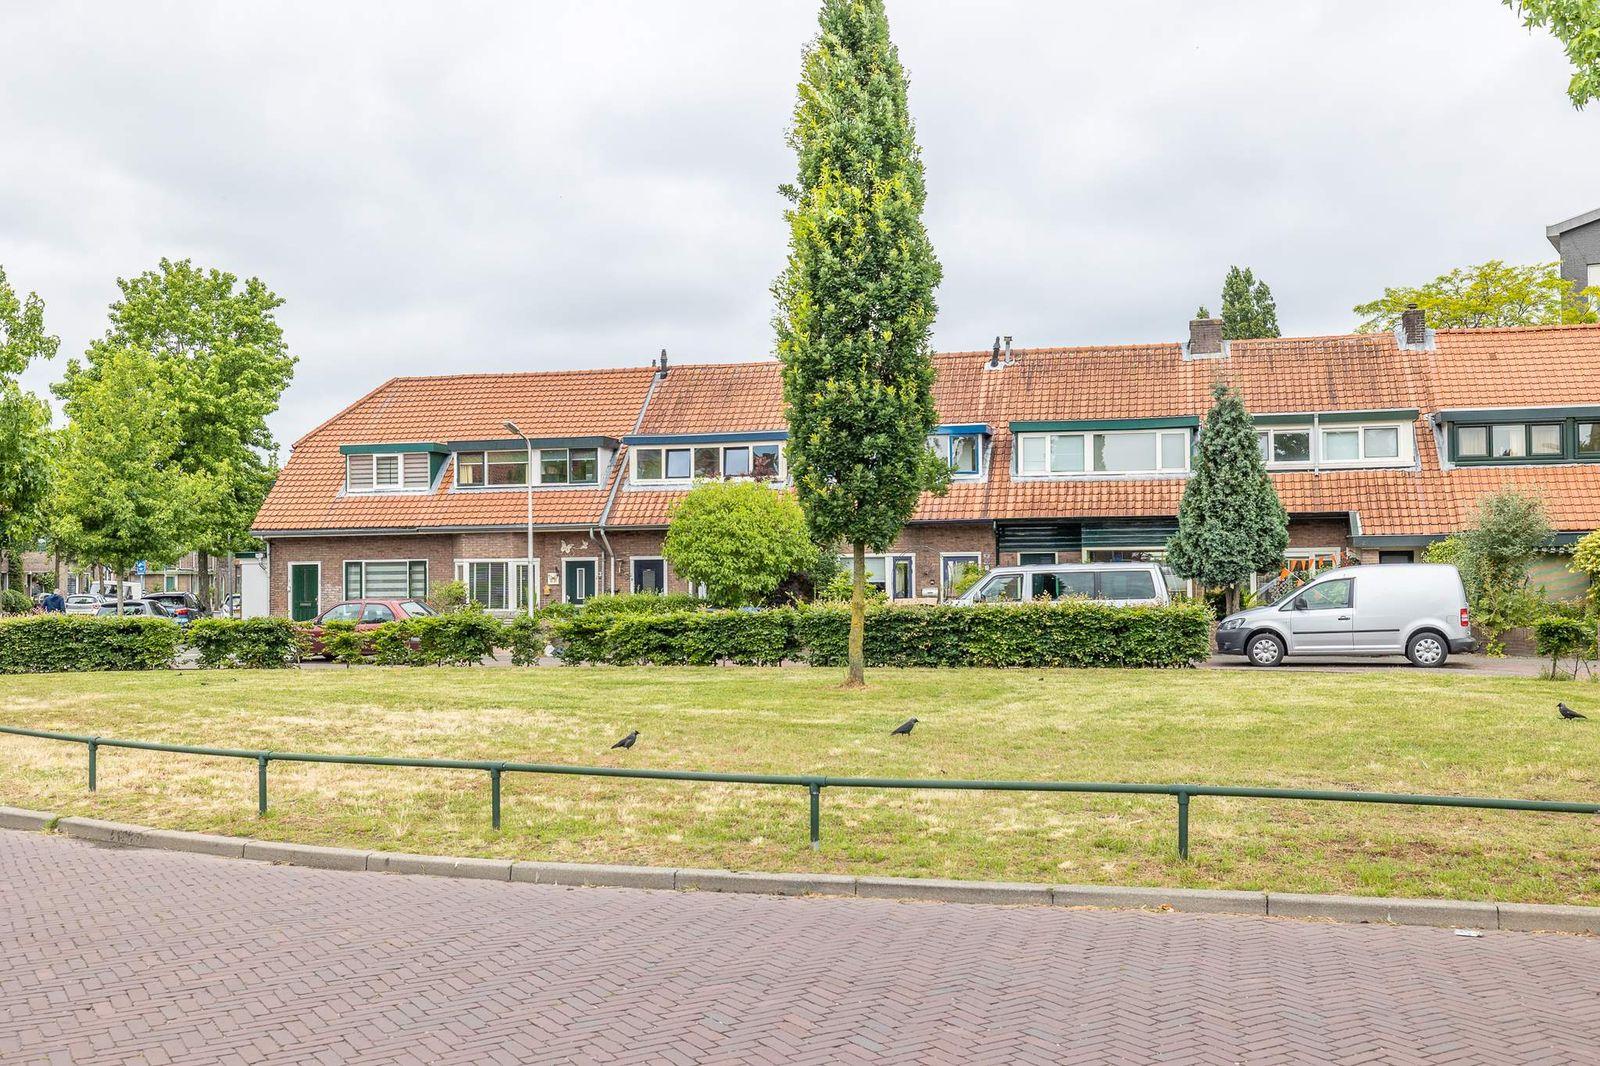 Lorentzweg 3, Hilversum